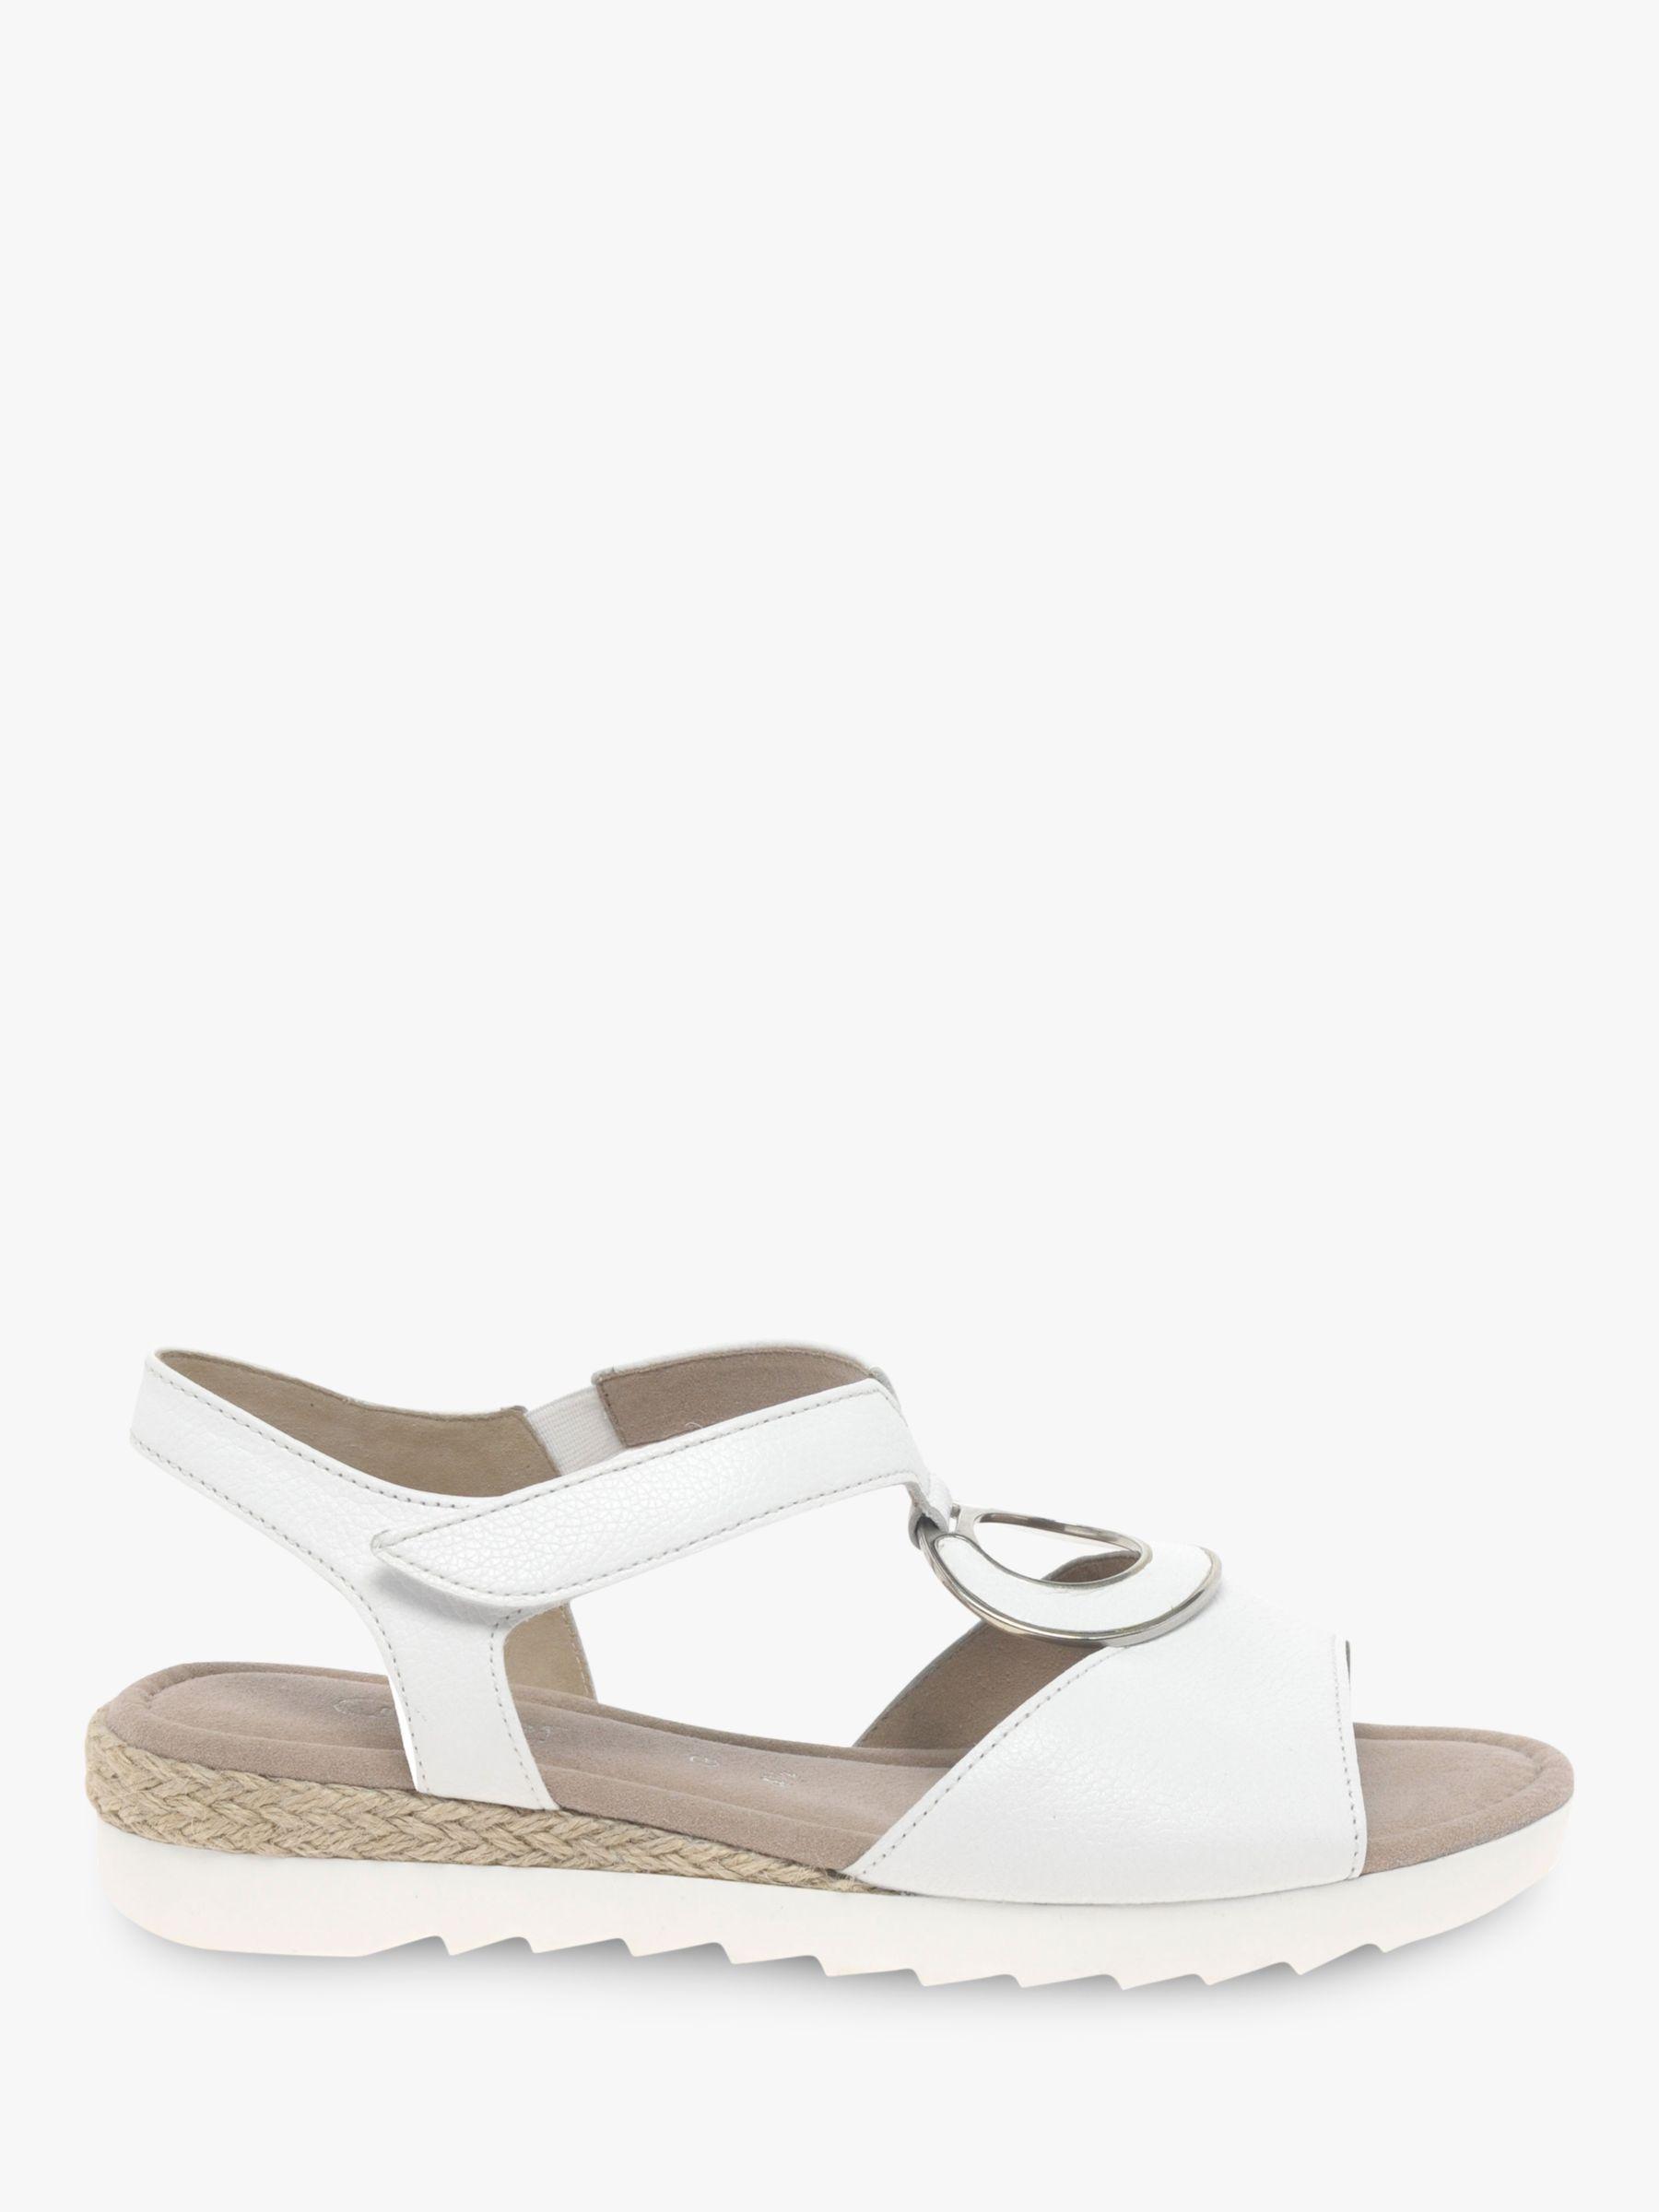 Gabor Ellis Wide Fit Low Wedge Sandals